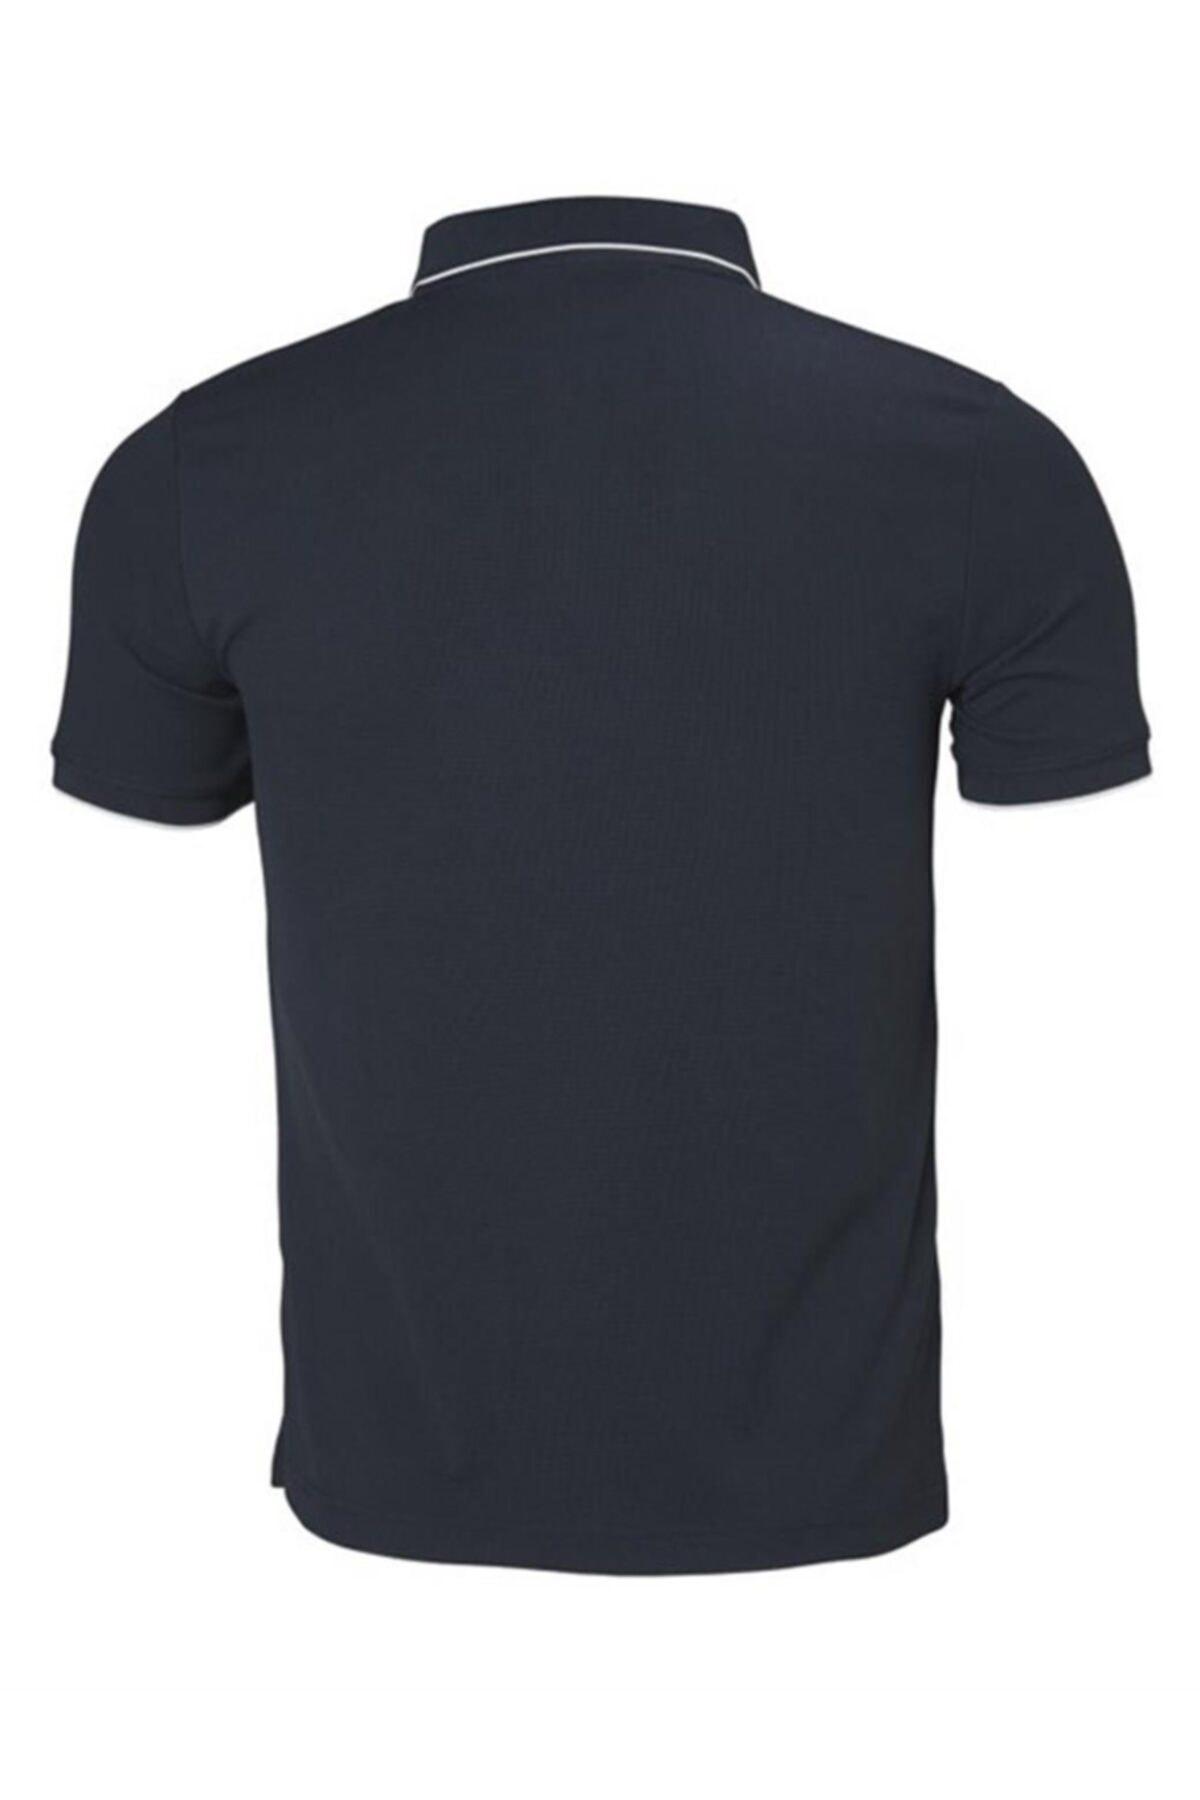 Helly Hansen Kos Polo Yaka Erkek T-shirt Lacivert 2